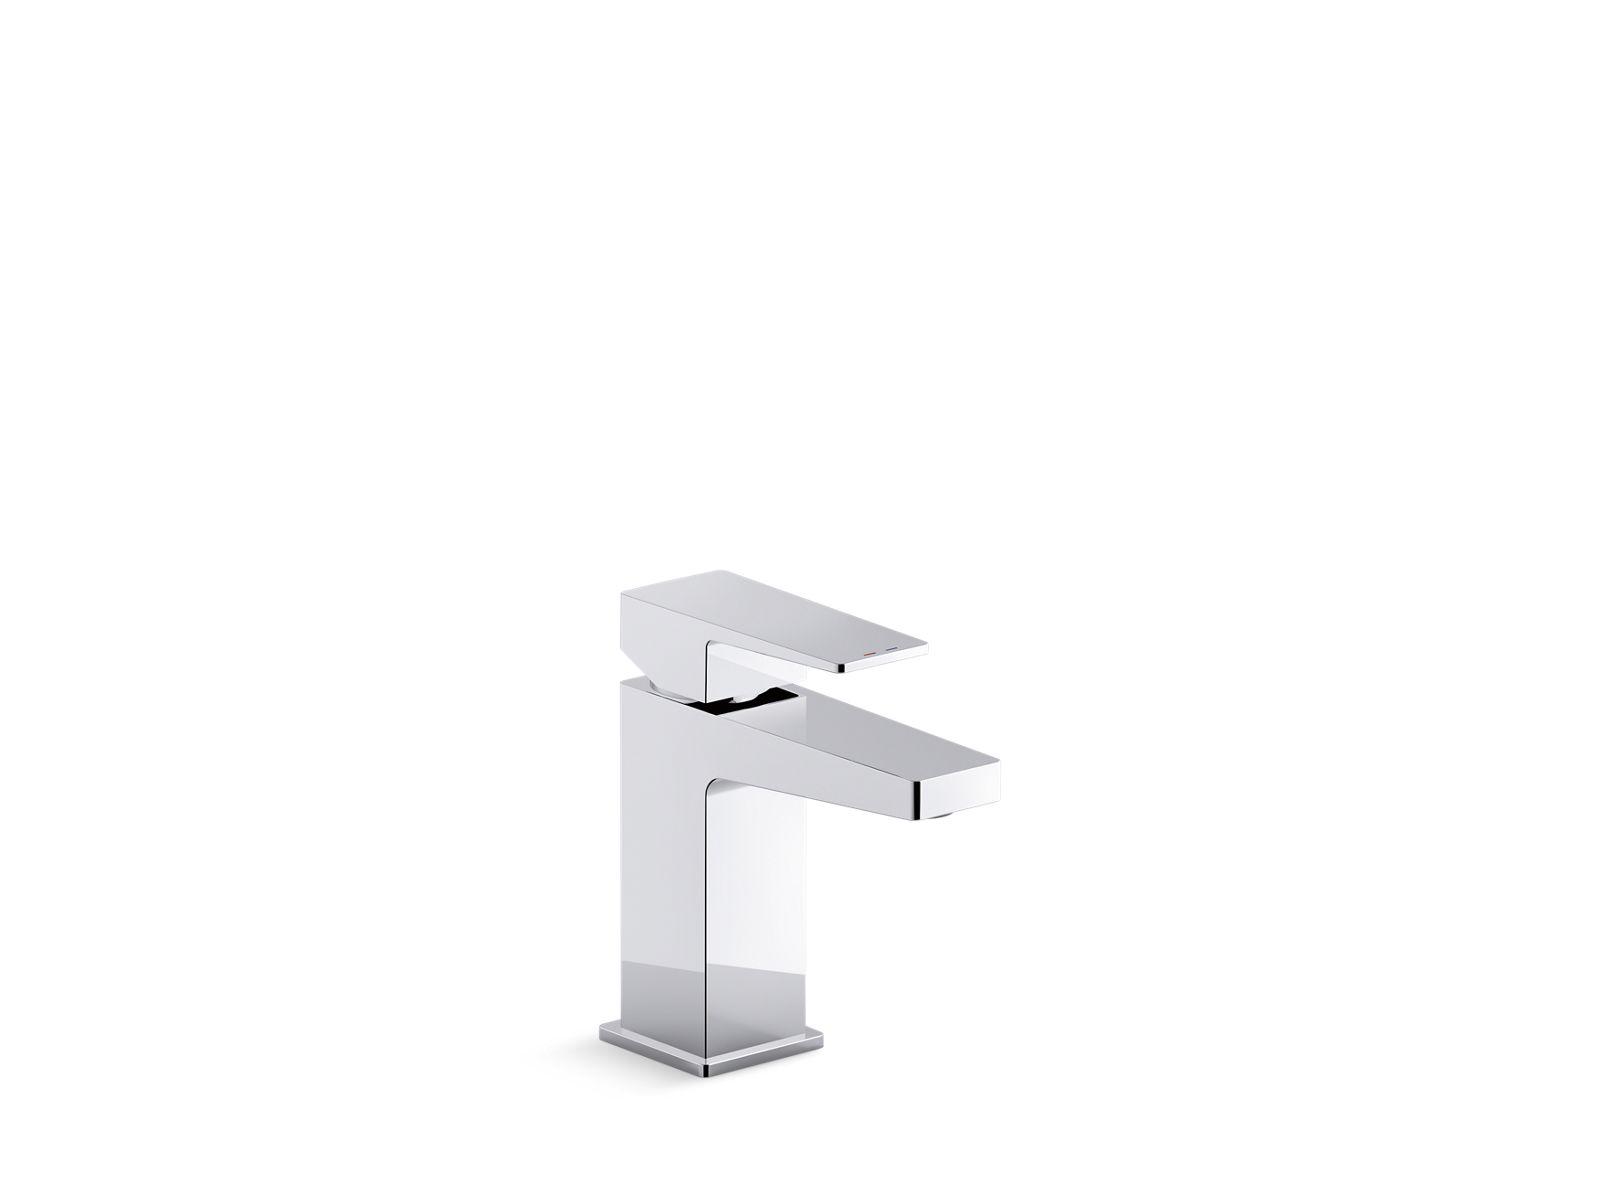 k 99760 4 honesty single handle bathroom sink faucet kohler